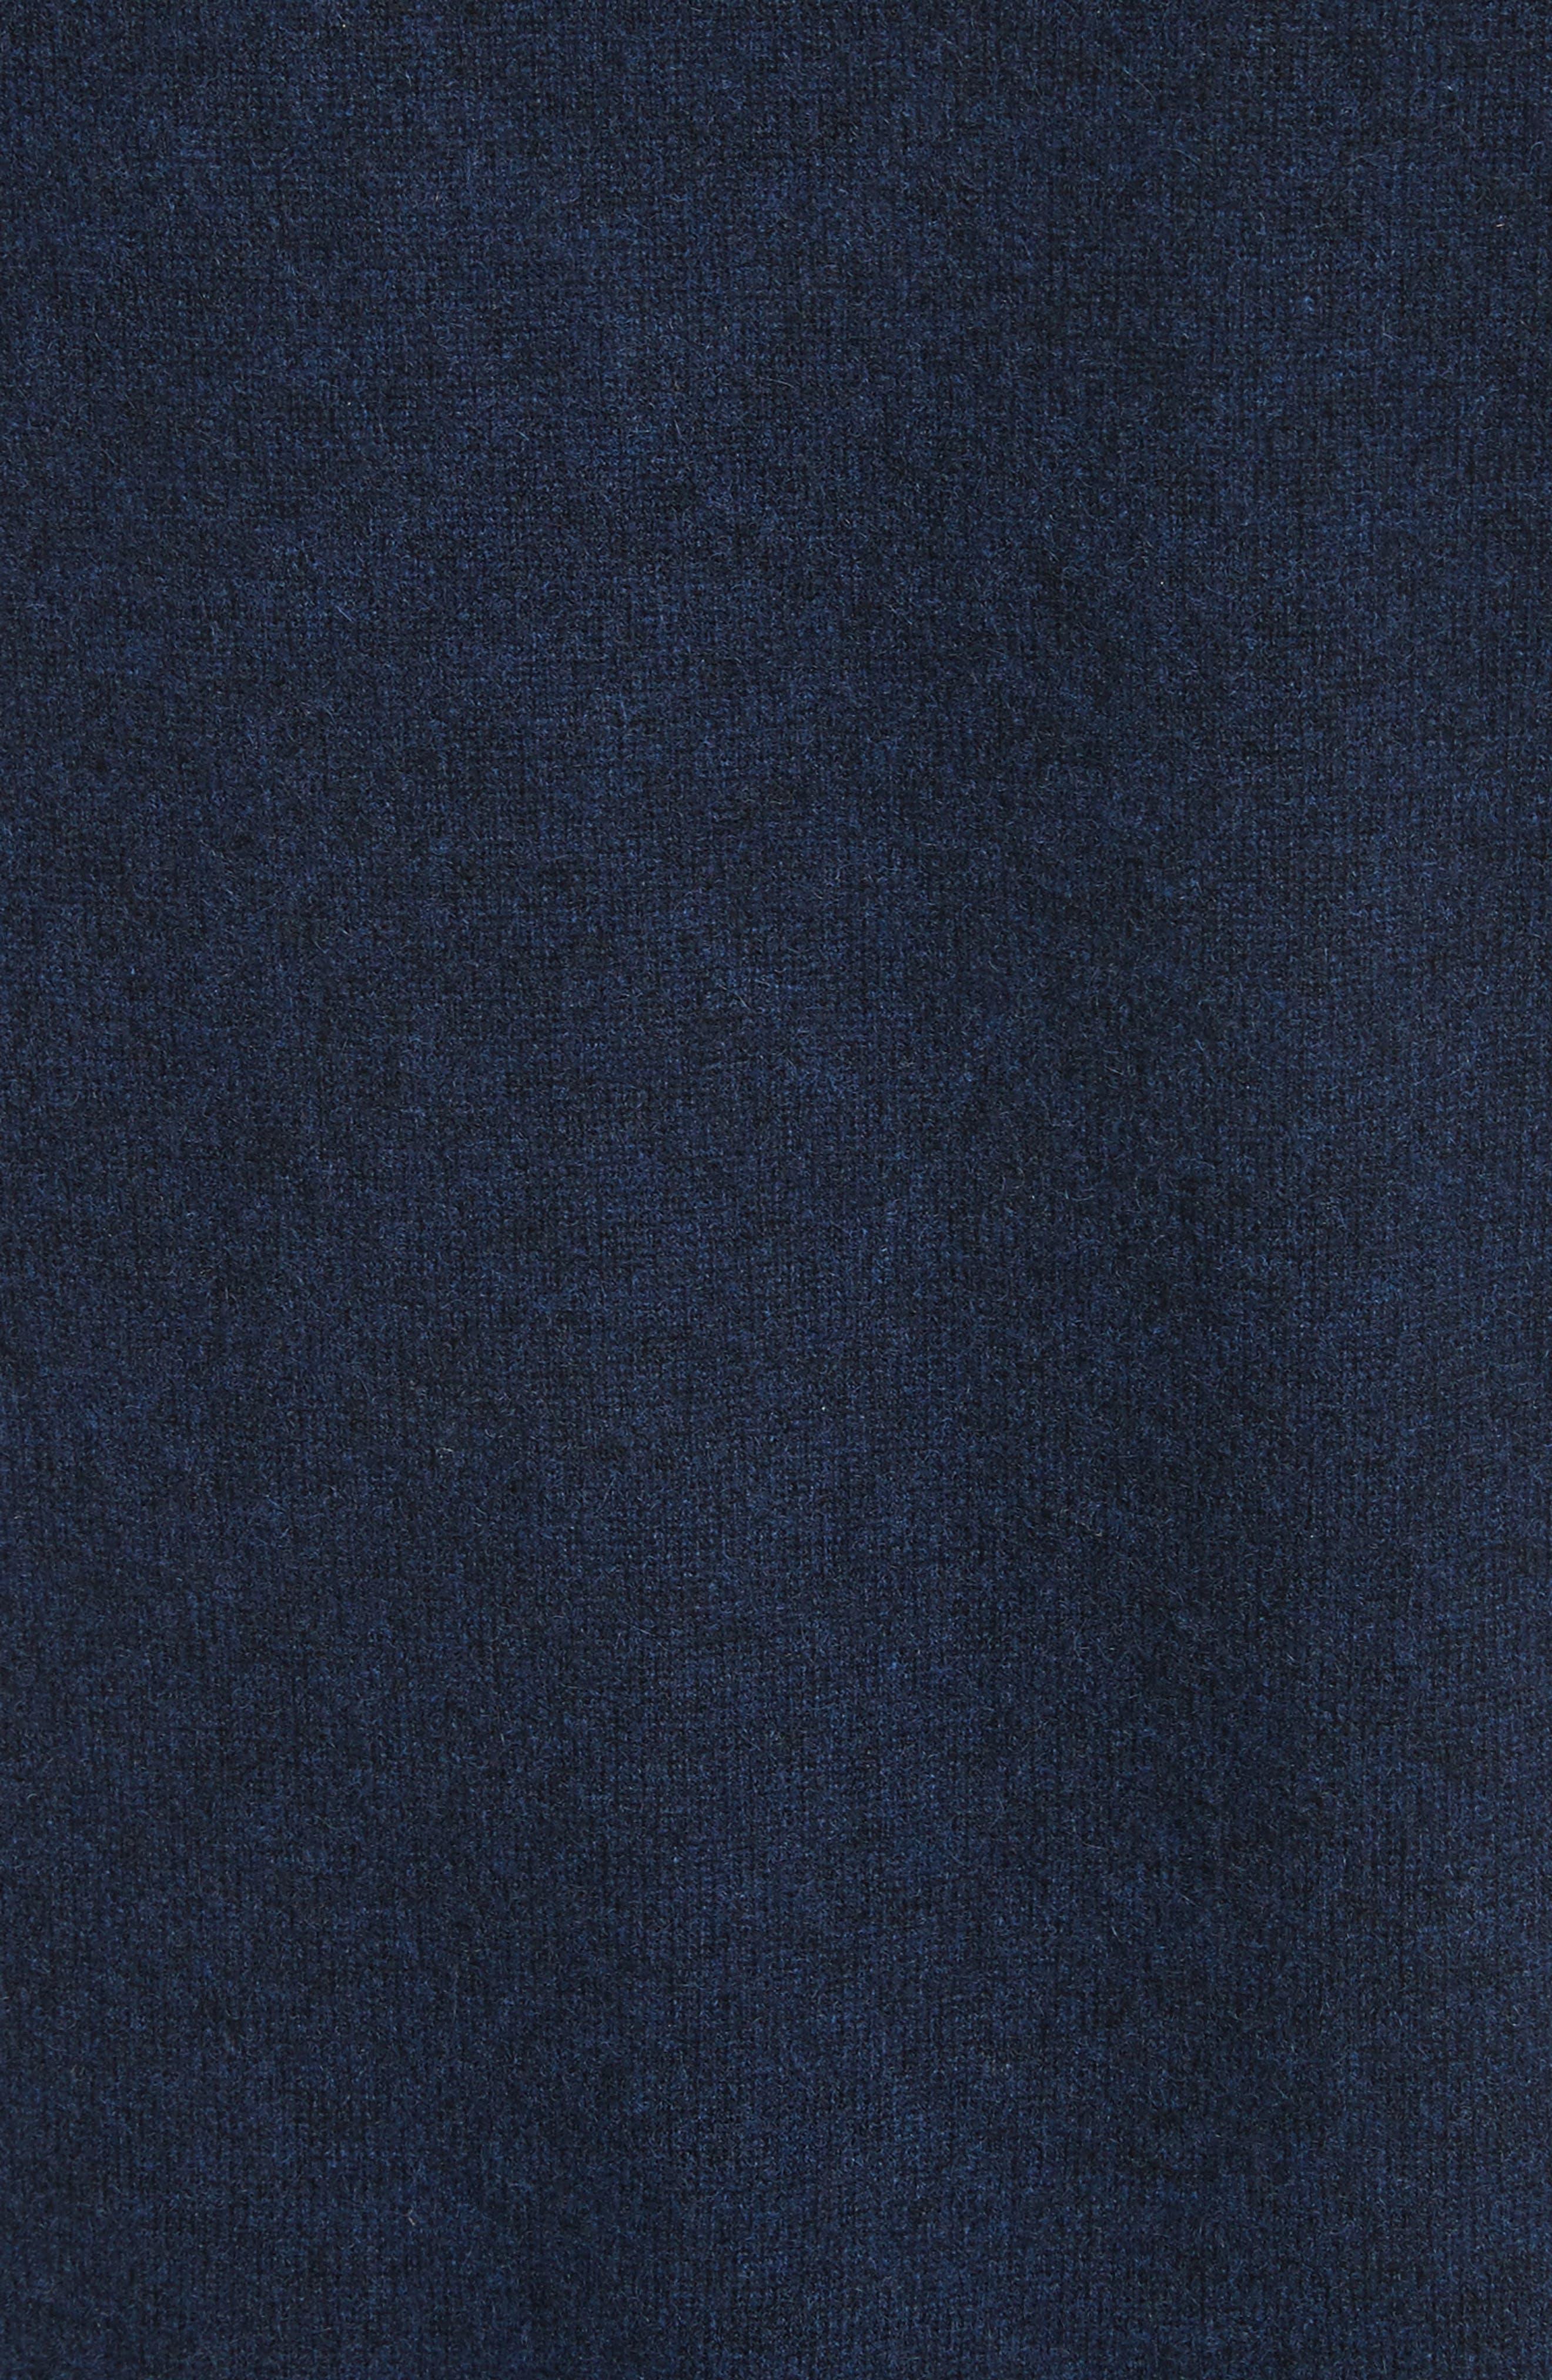 V-Neck Cashmere Sweater,                             Alternate thumbnail 10, color,